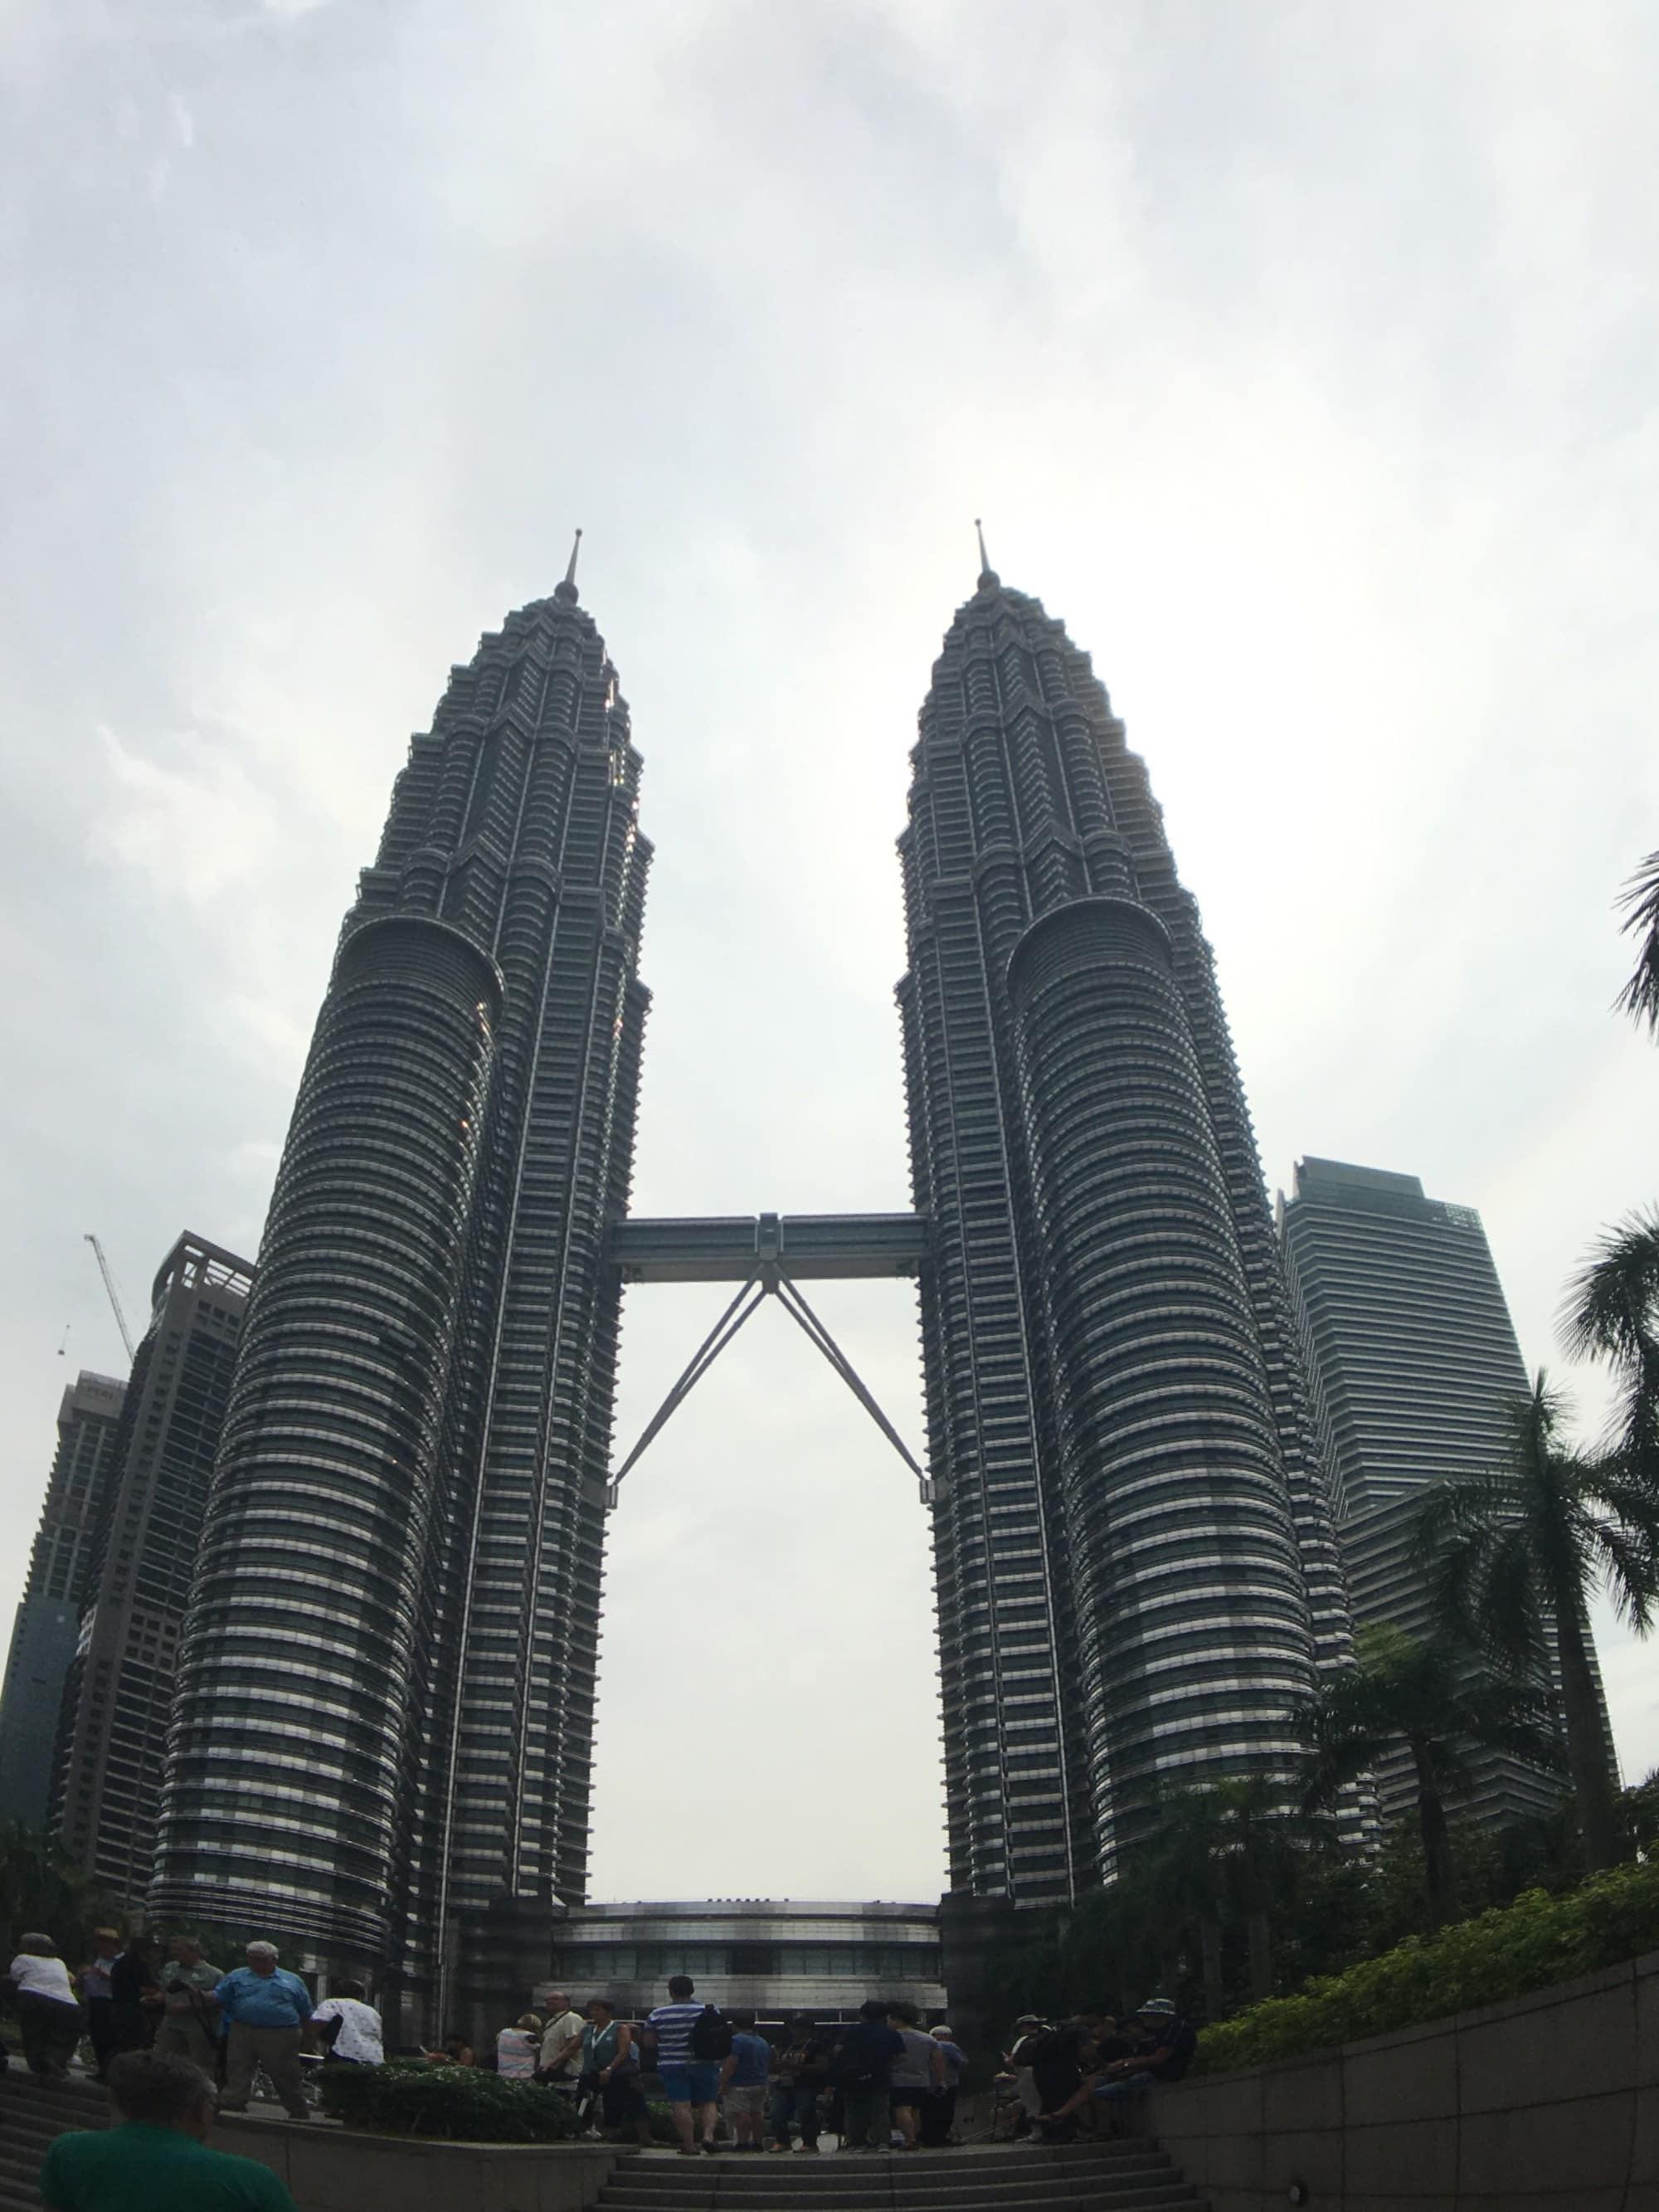 Travel guide to Malaysia: Kuala Lumpur